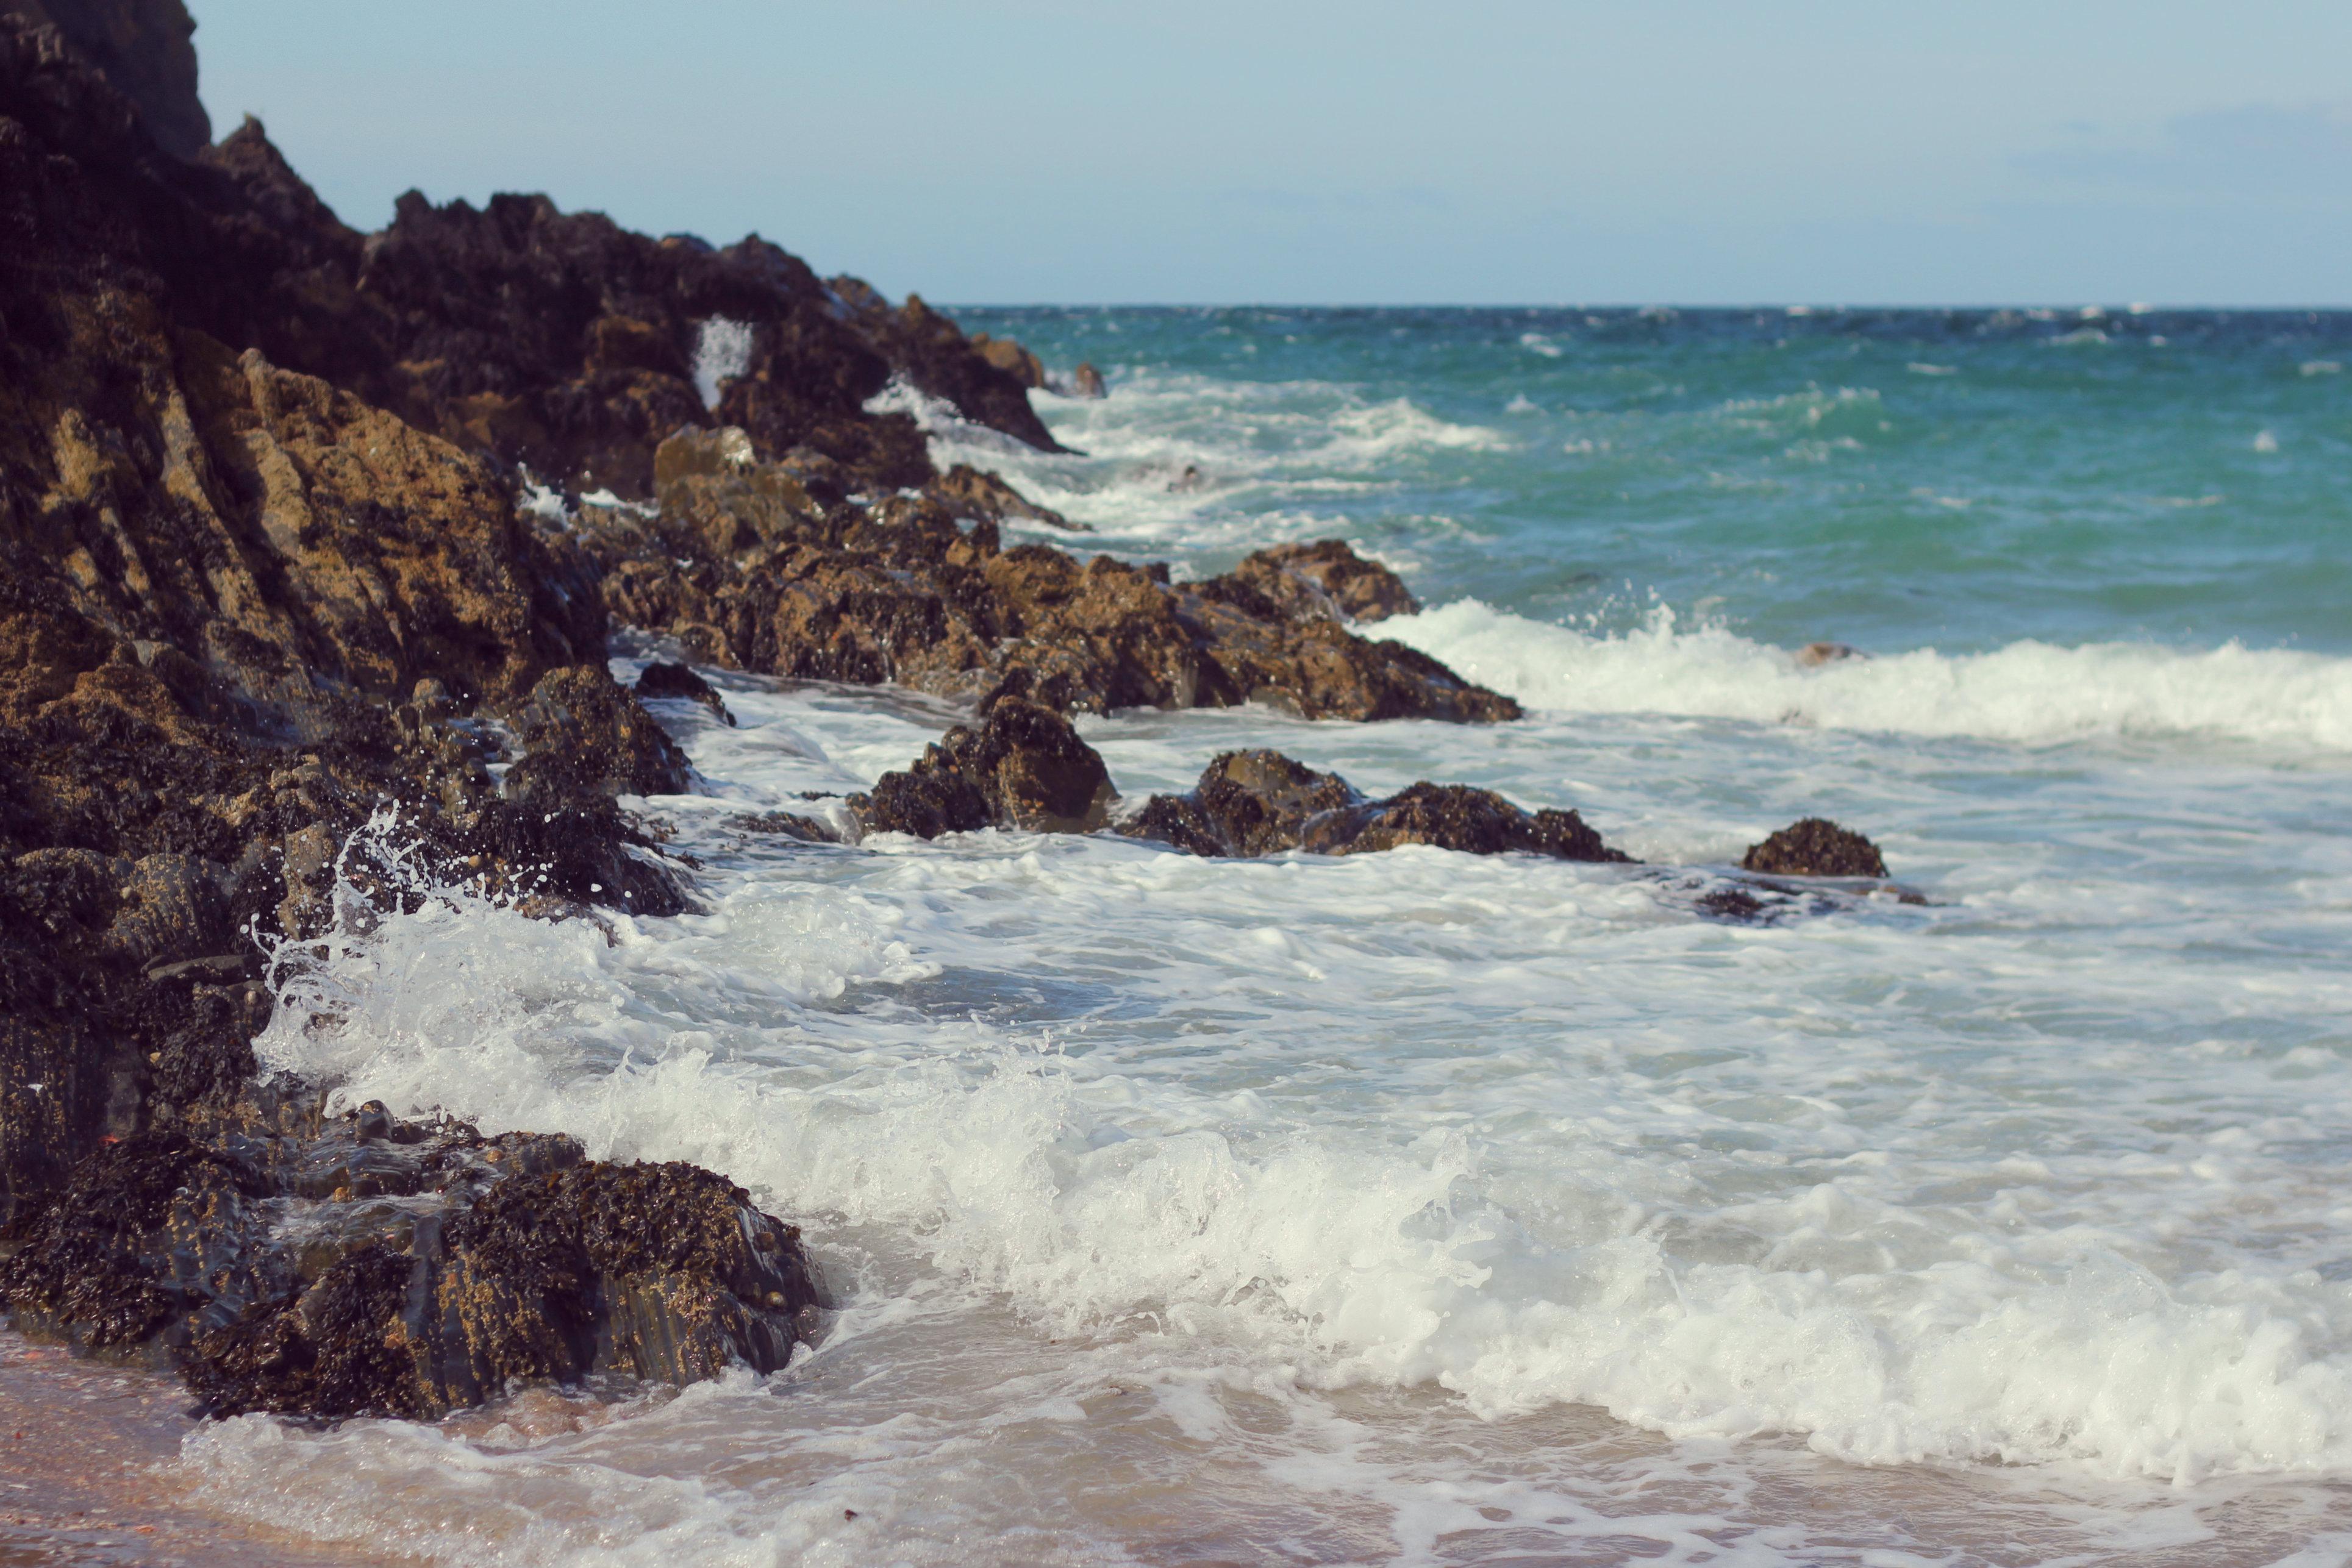 Fenella Beach, Isle of Man, Beach, Coast, Isle of Man, Ocean, HQ Photo